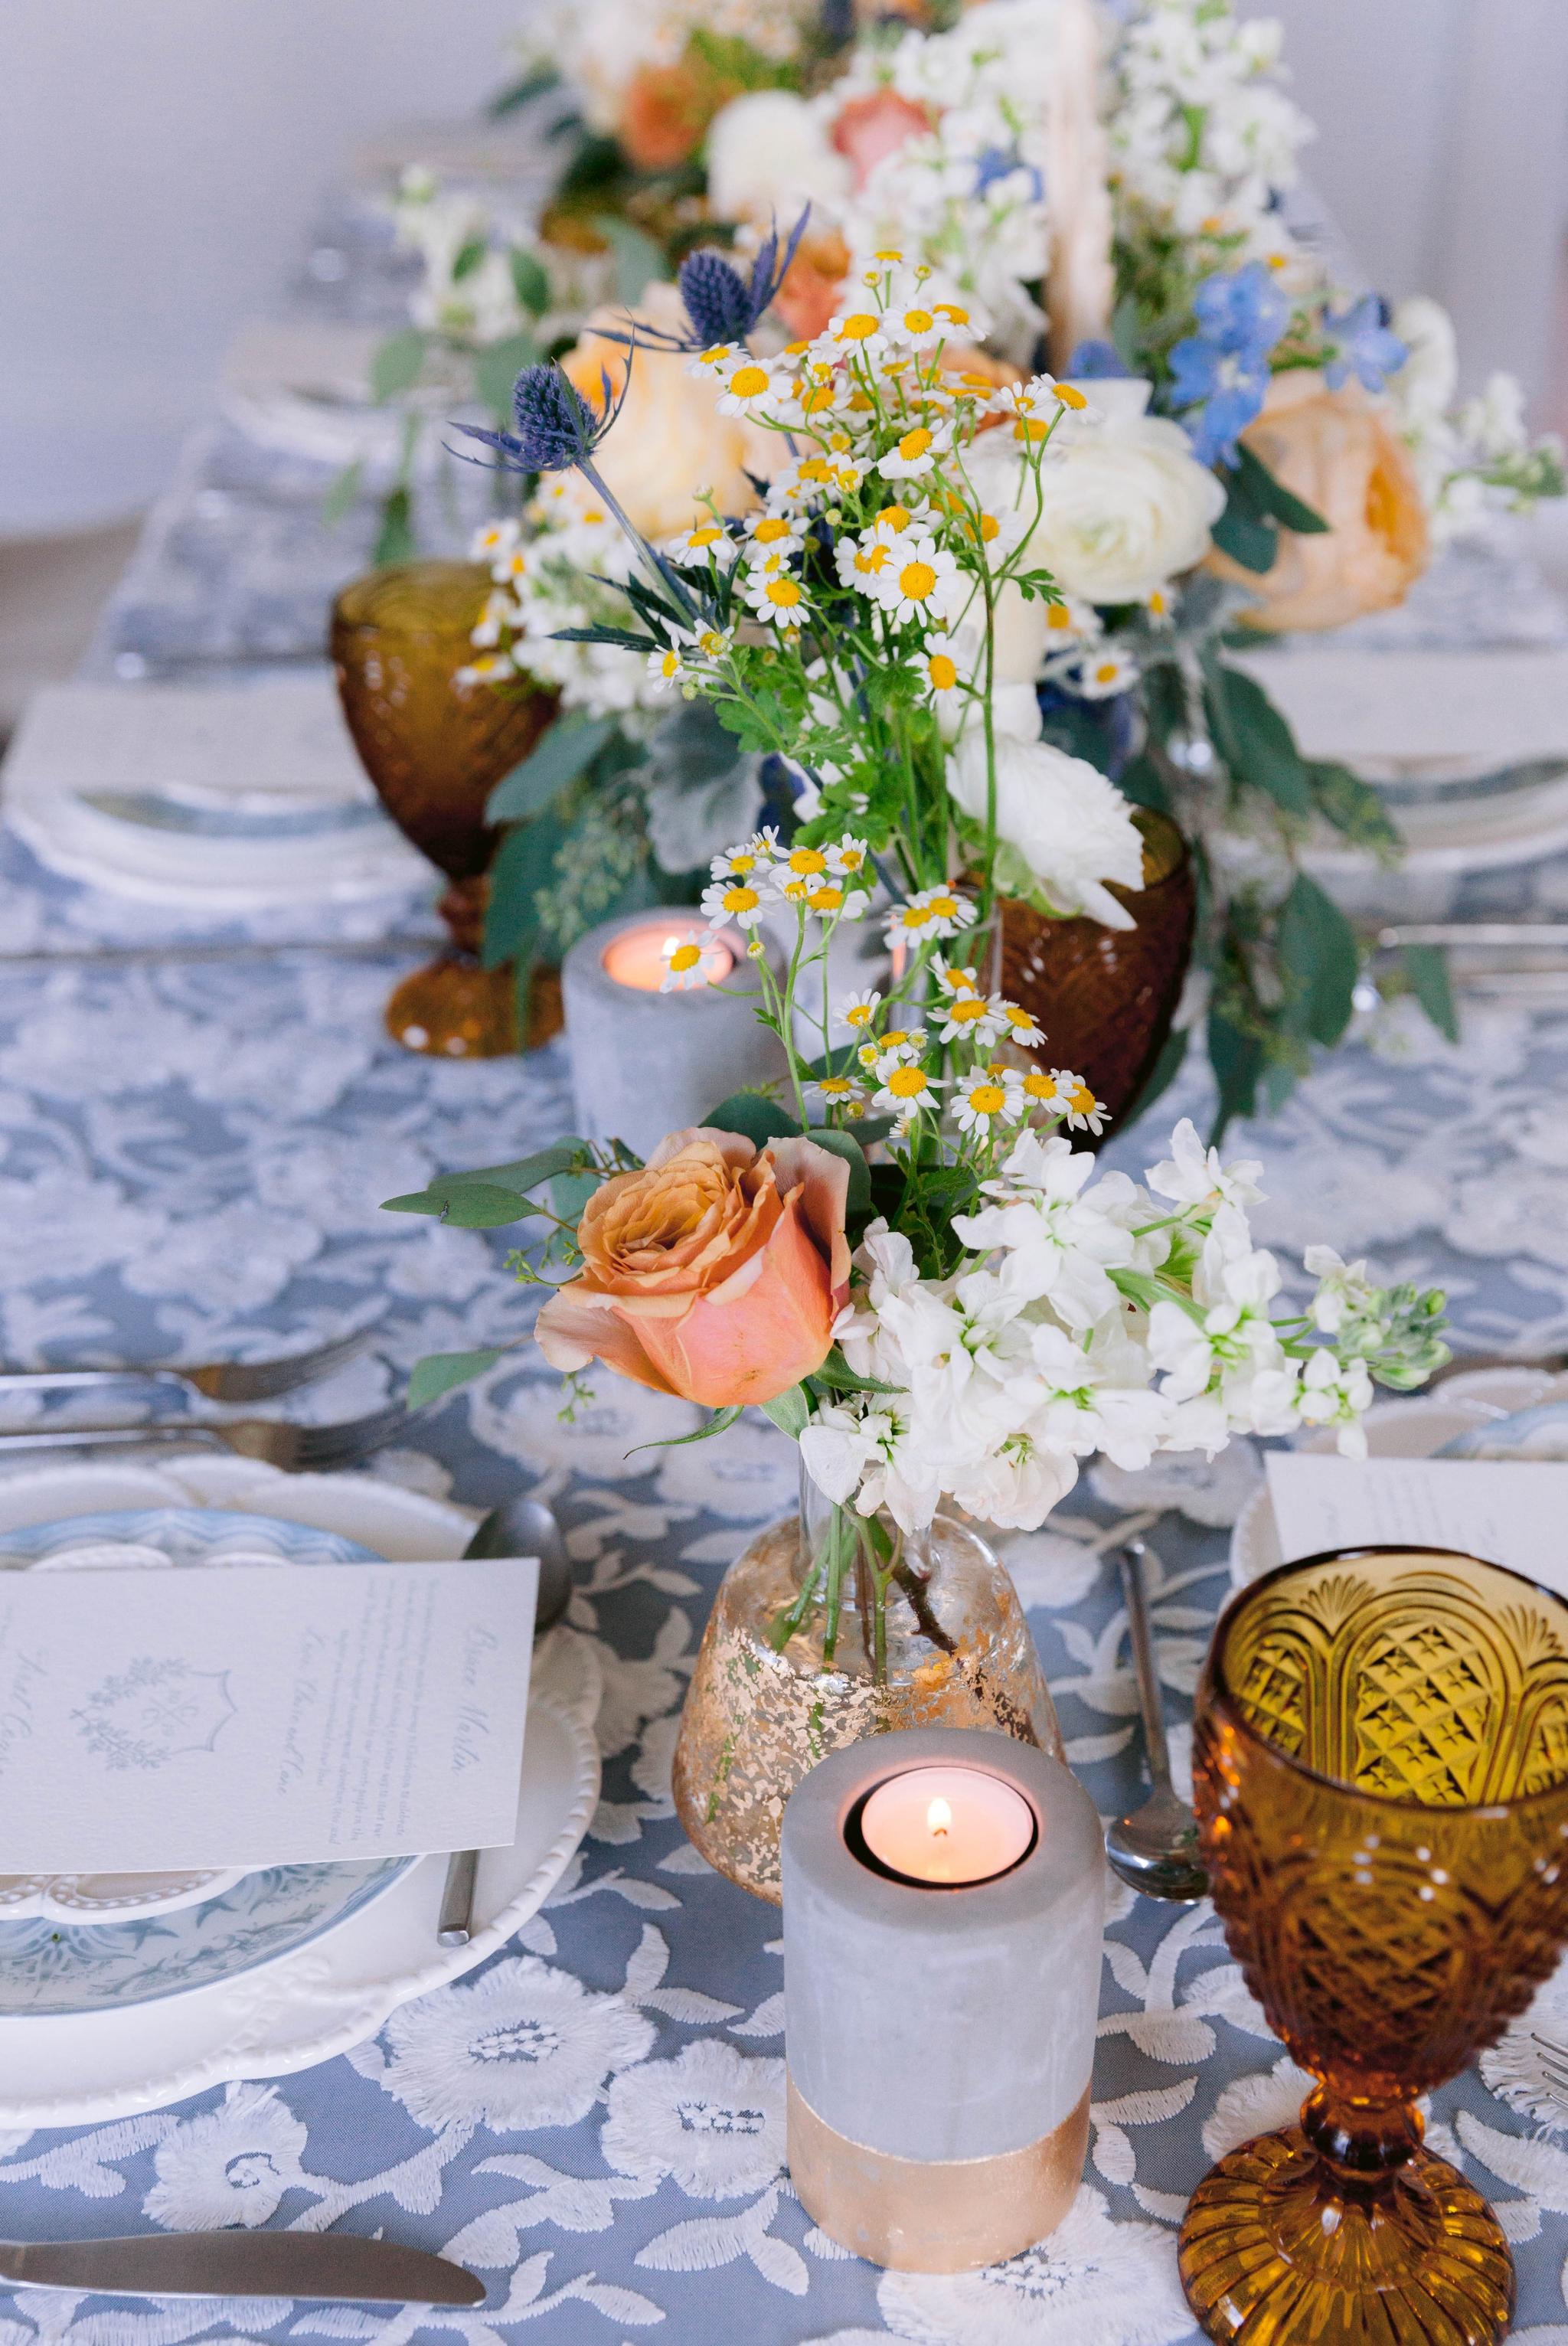 Pastel Blue Wedding Fine Art Wedding Inspiration - Honolulu, Oahu, Hawaii Wedding Photographer - Johanna Dye Photography 32.jpg